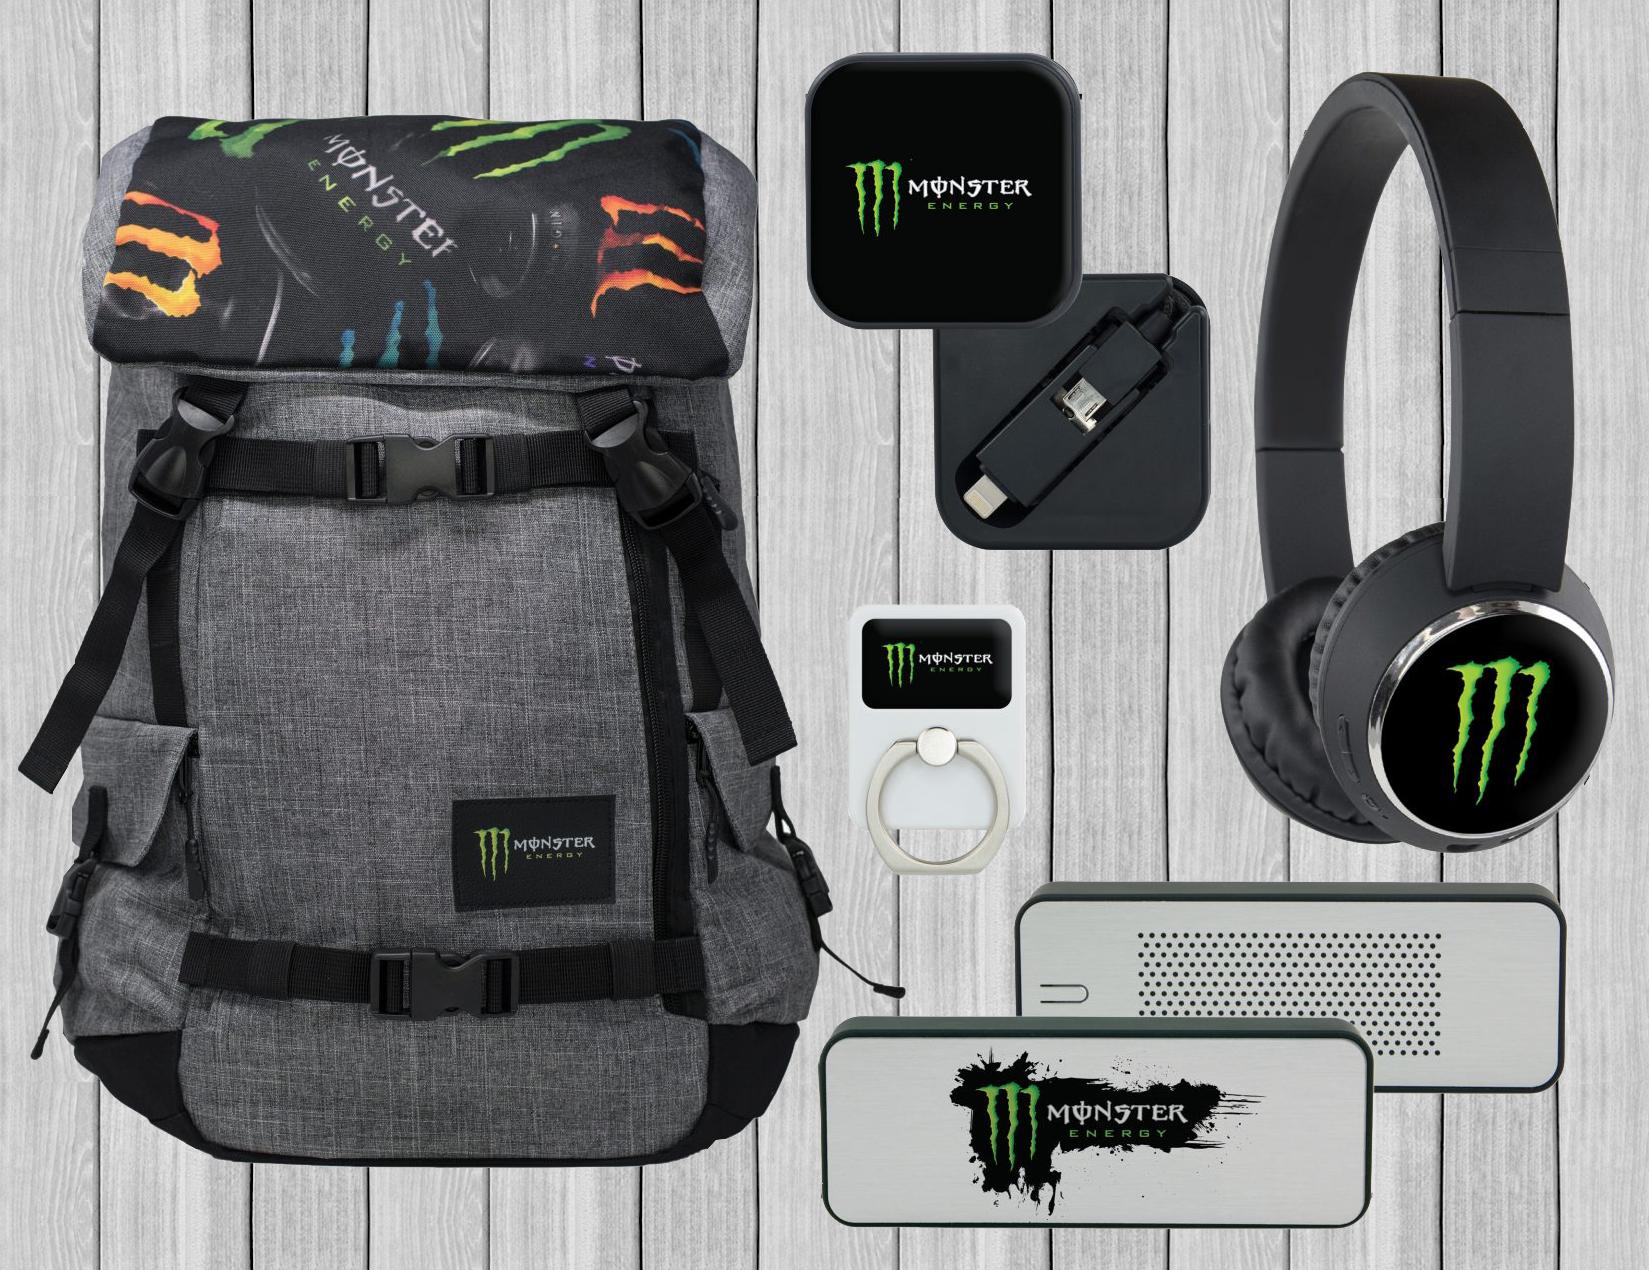 Monster Welcome Kit